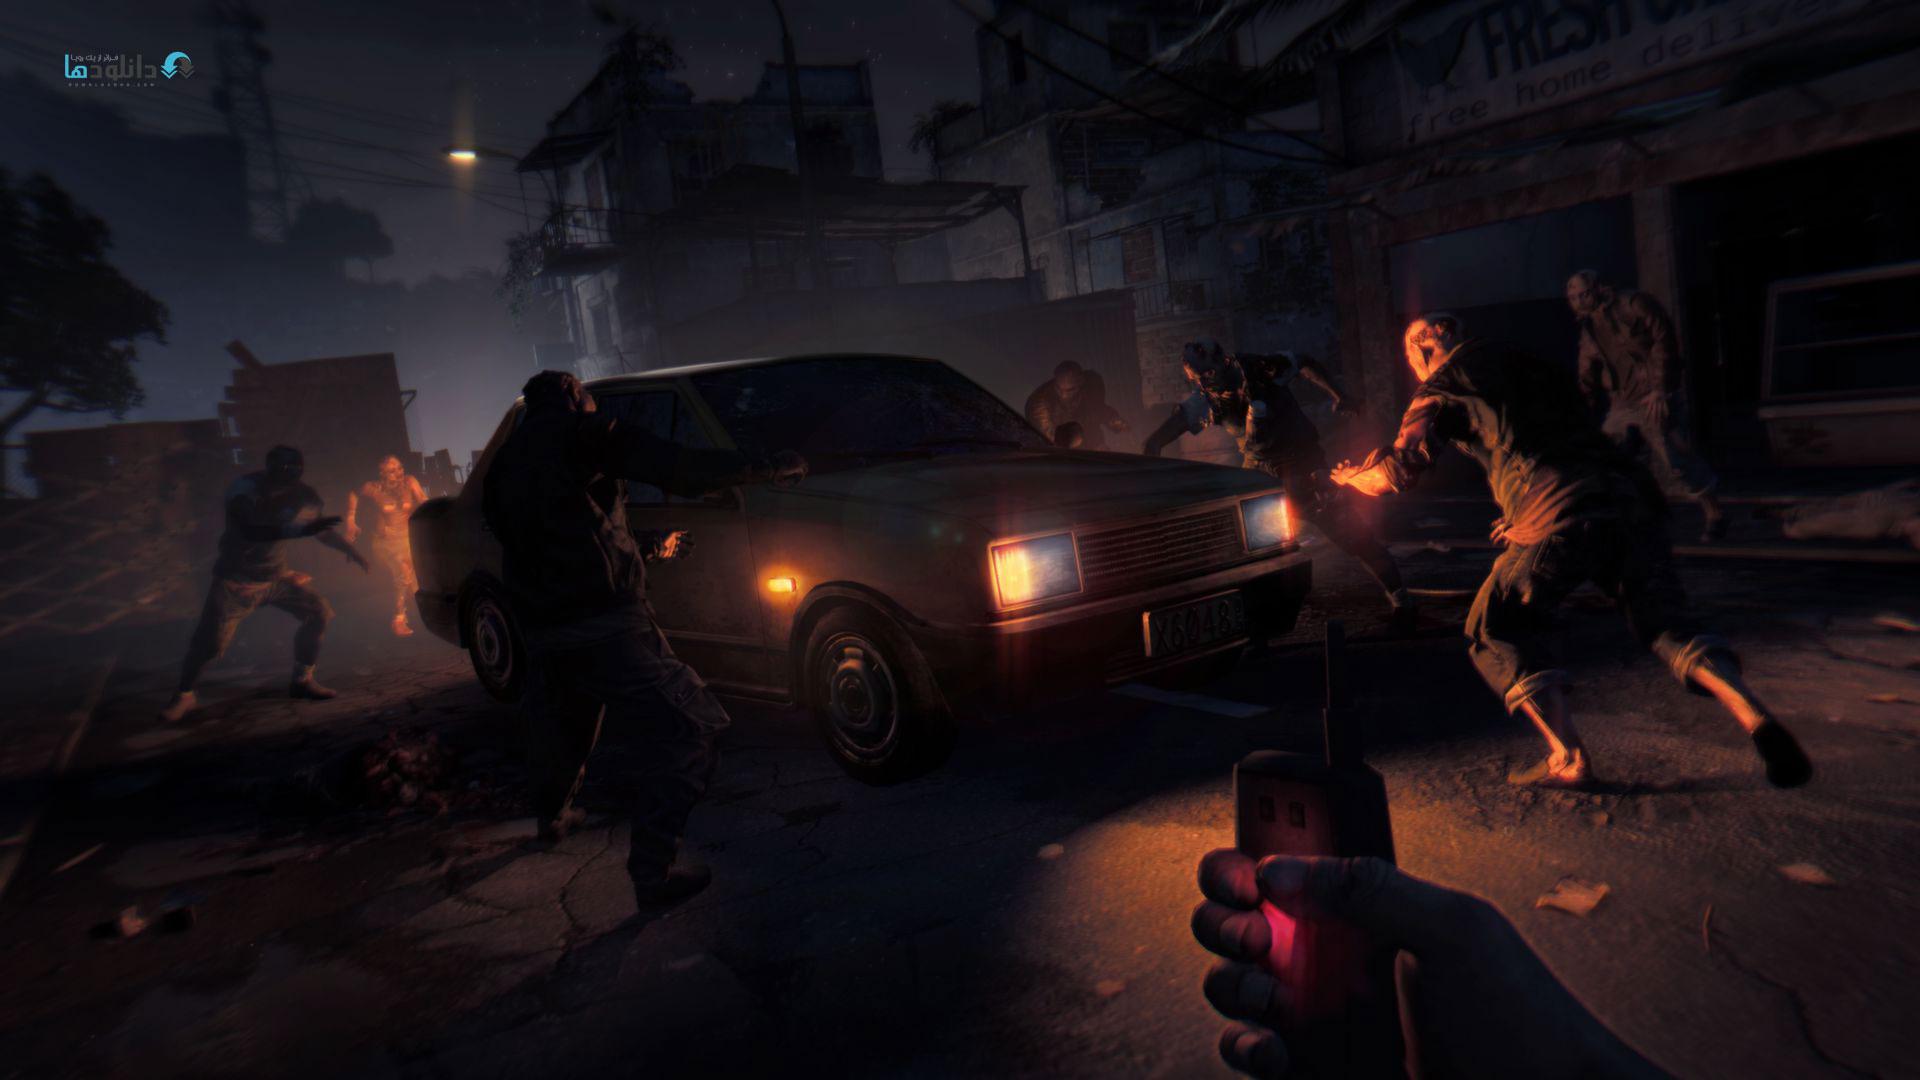 http://img5.downloadha.com/hosein/Game/January%202015/27/Dying-Light-screenshots-06-large.jpg